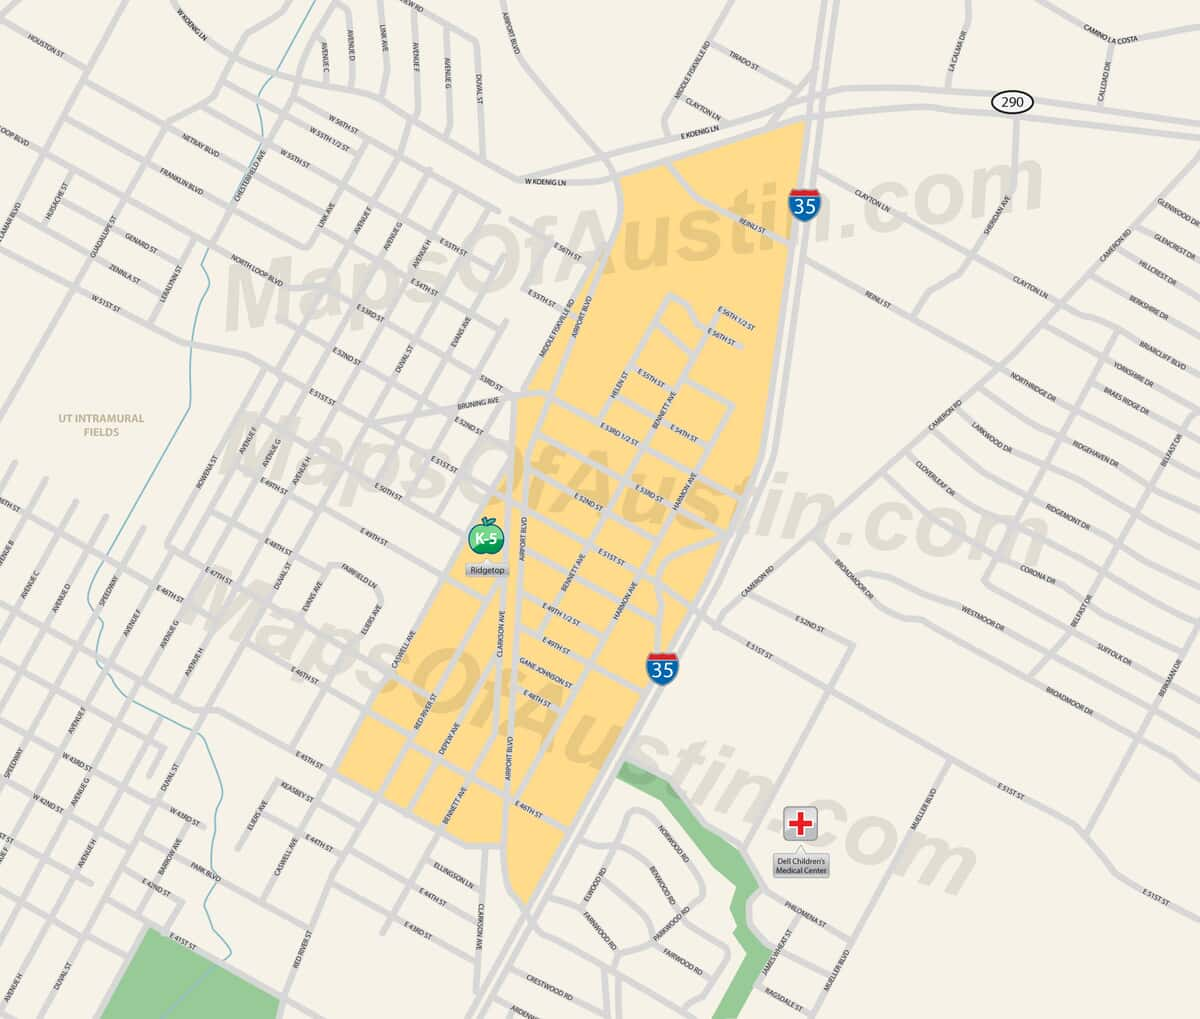 Ridgetop Austin, TX - Ridgetop Neighborhood in Austin | Maps ... on texas austin, fox news austin, halloween austin,